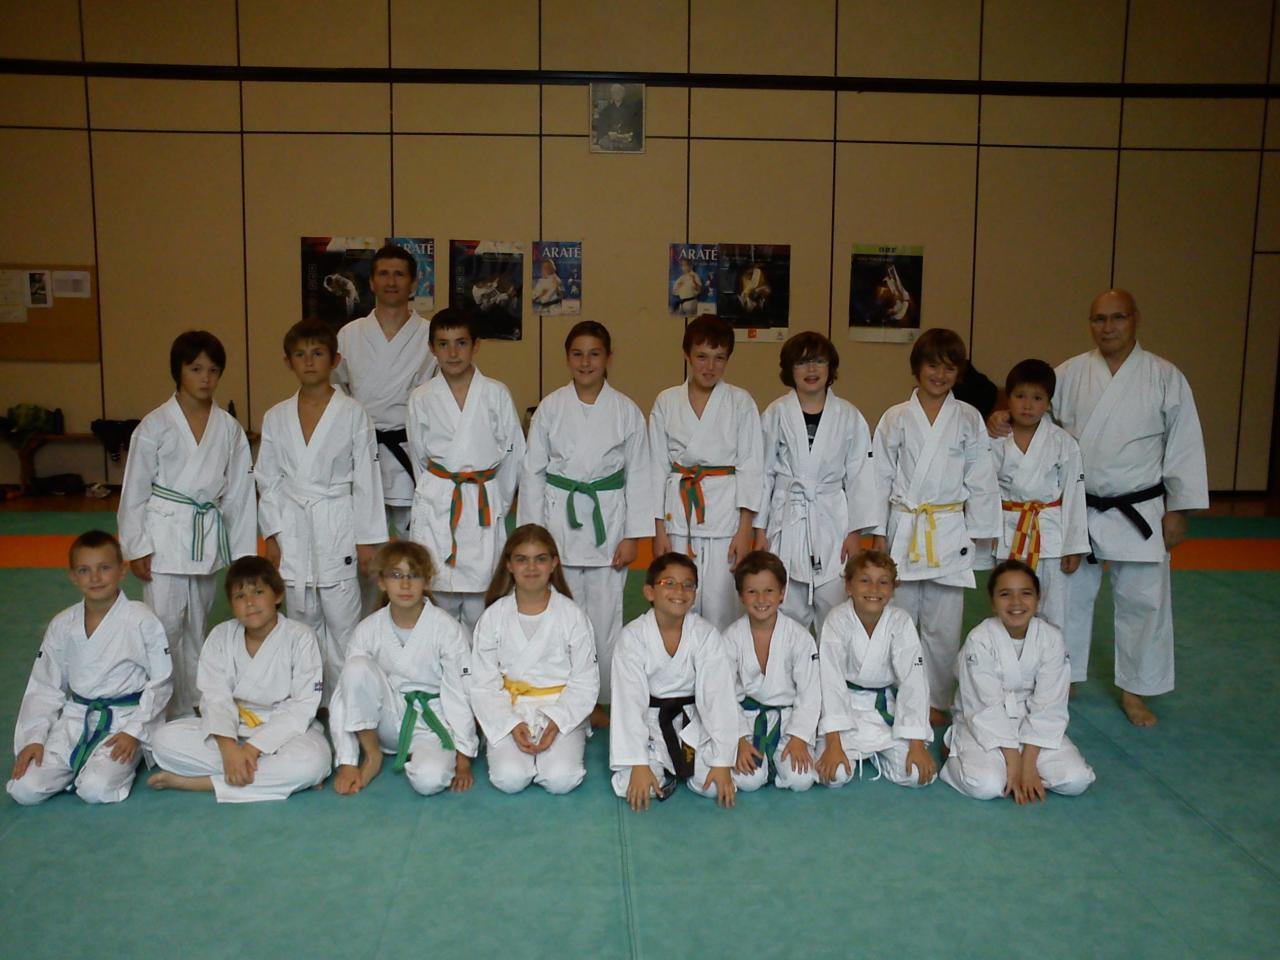 groupe+9-12 2012-2013